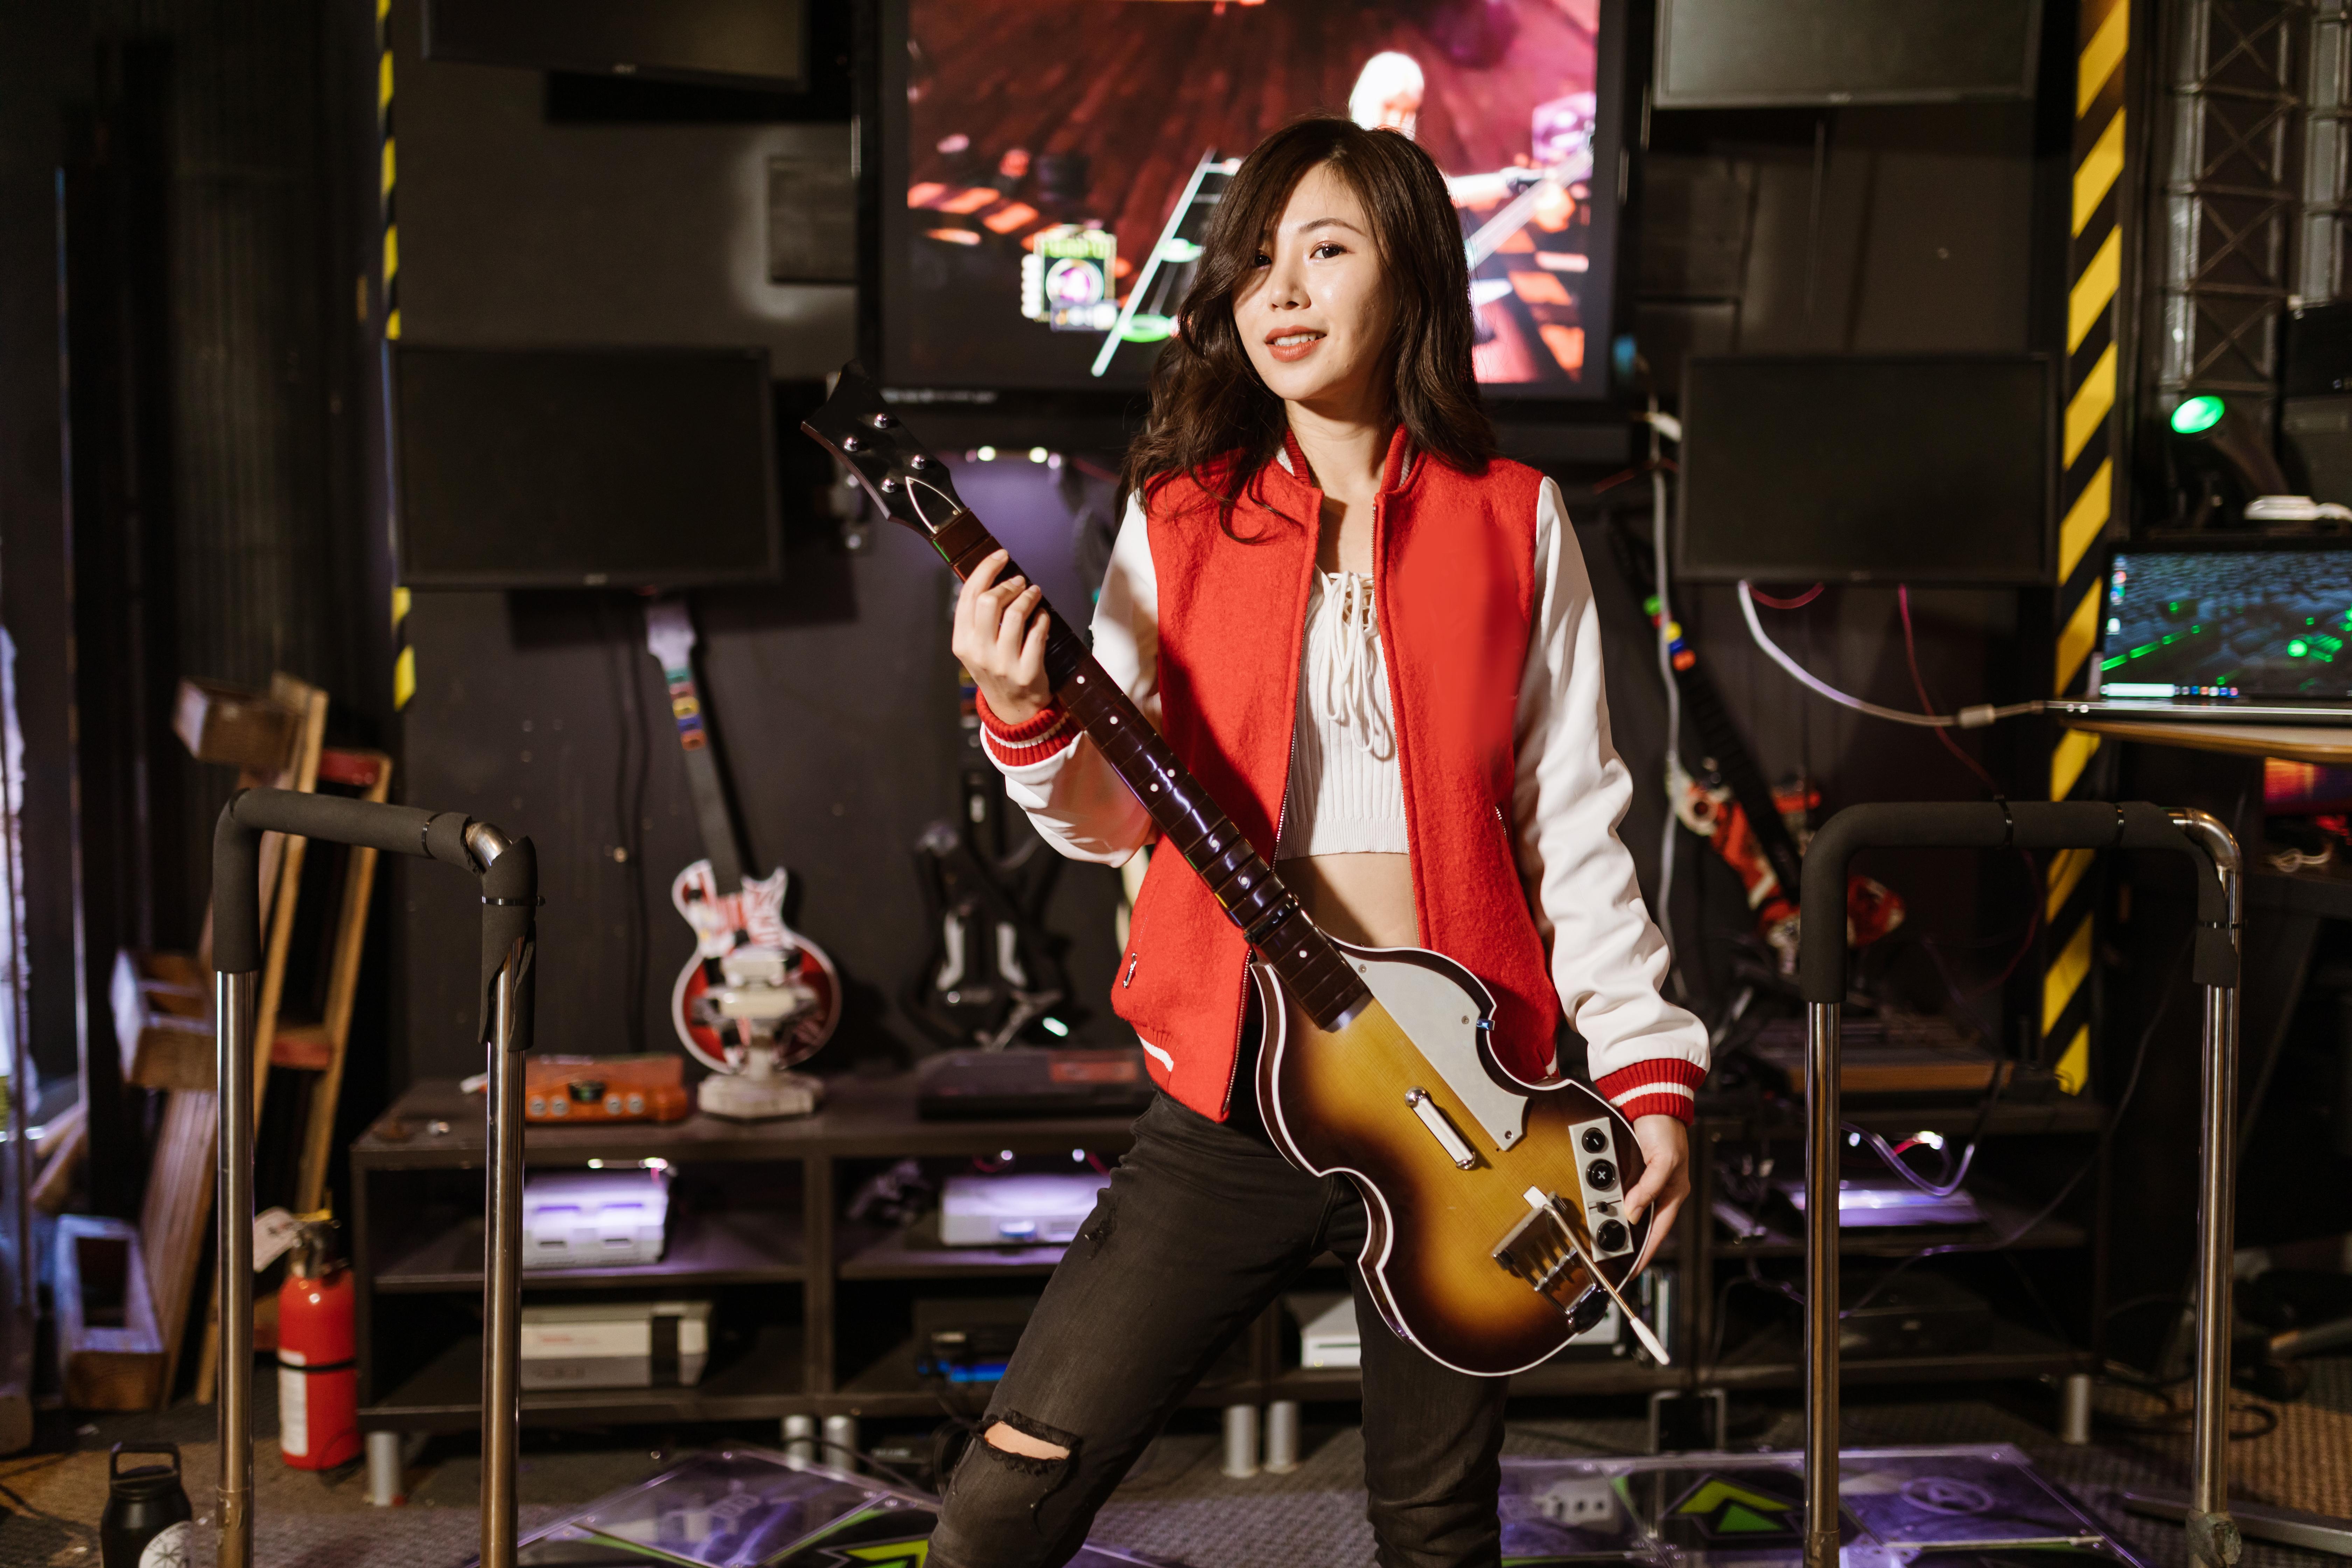 woman holding guitar controller